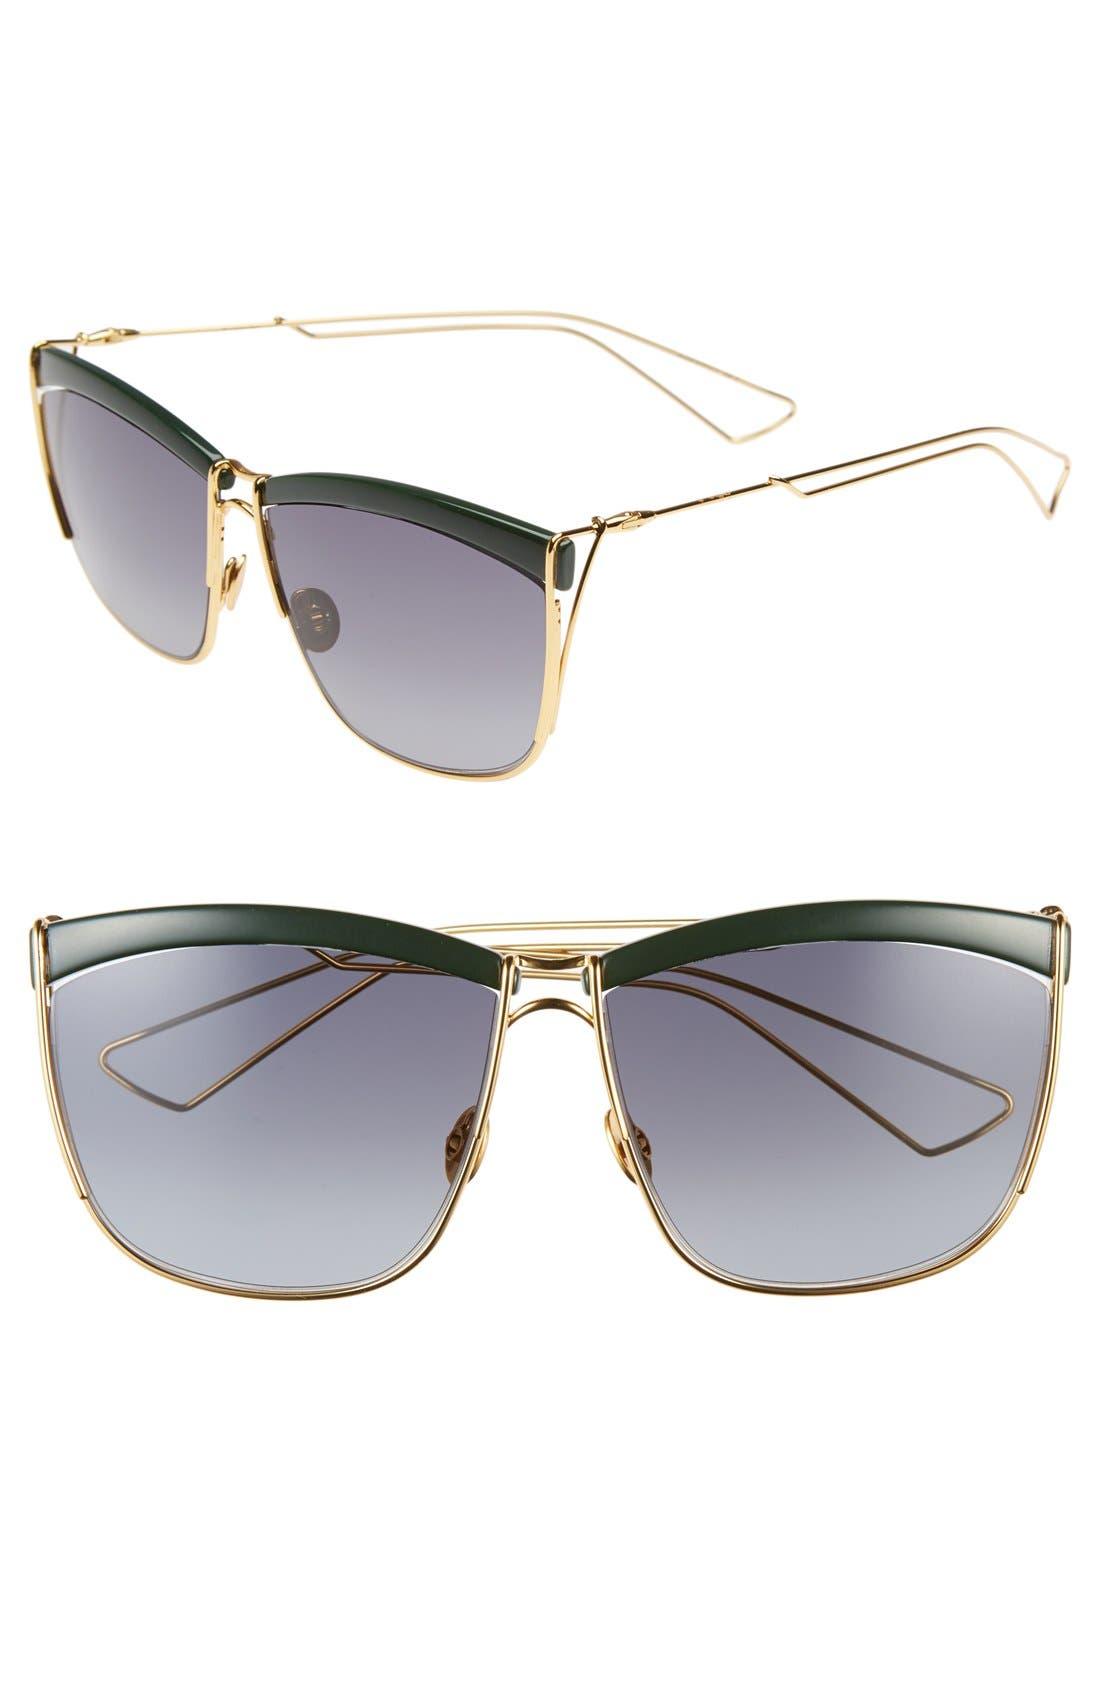 Main Image - Dior 58mm Retro Metal Sunglasses